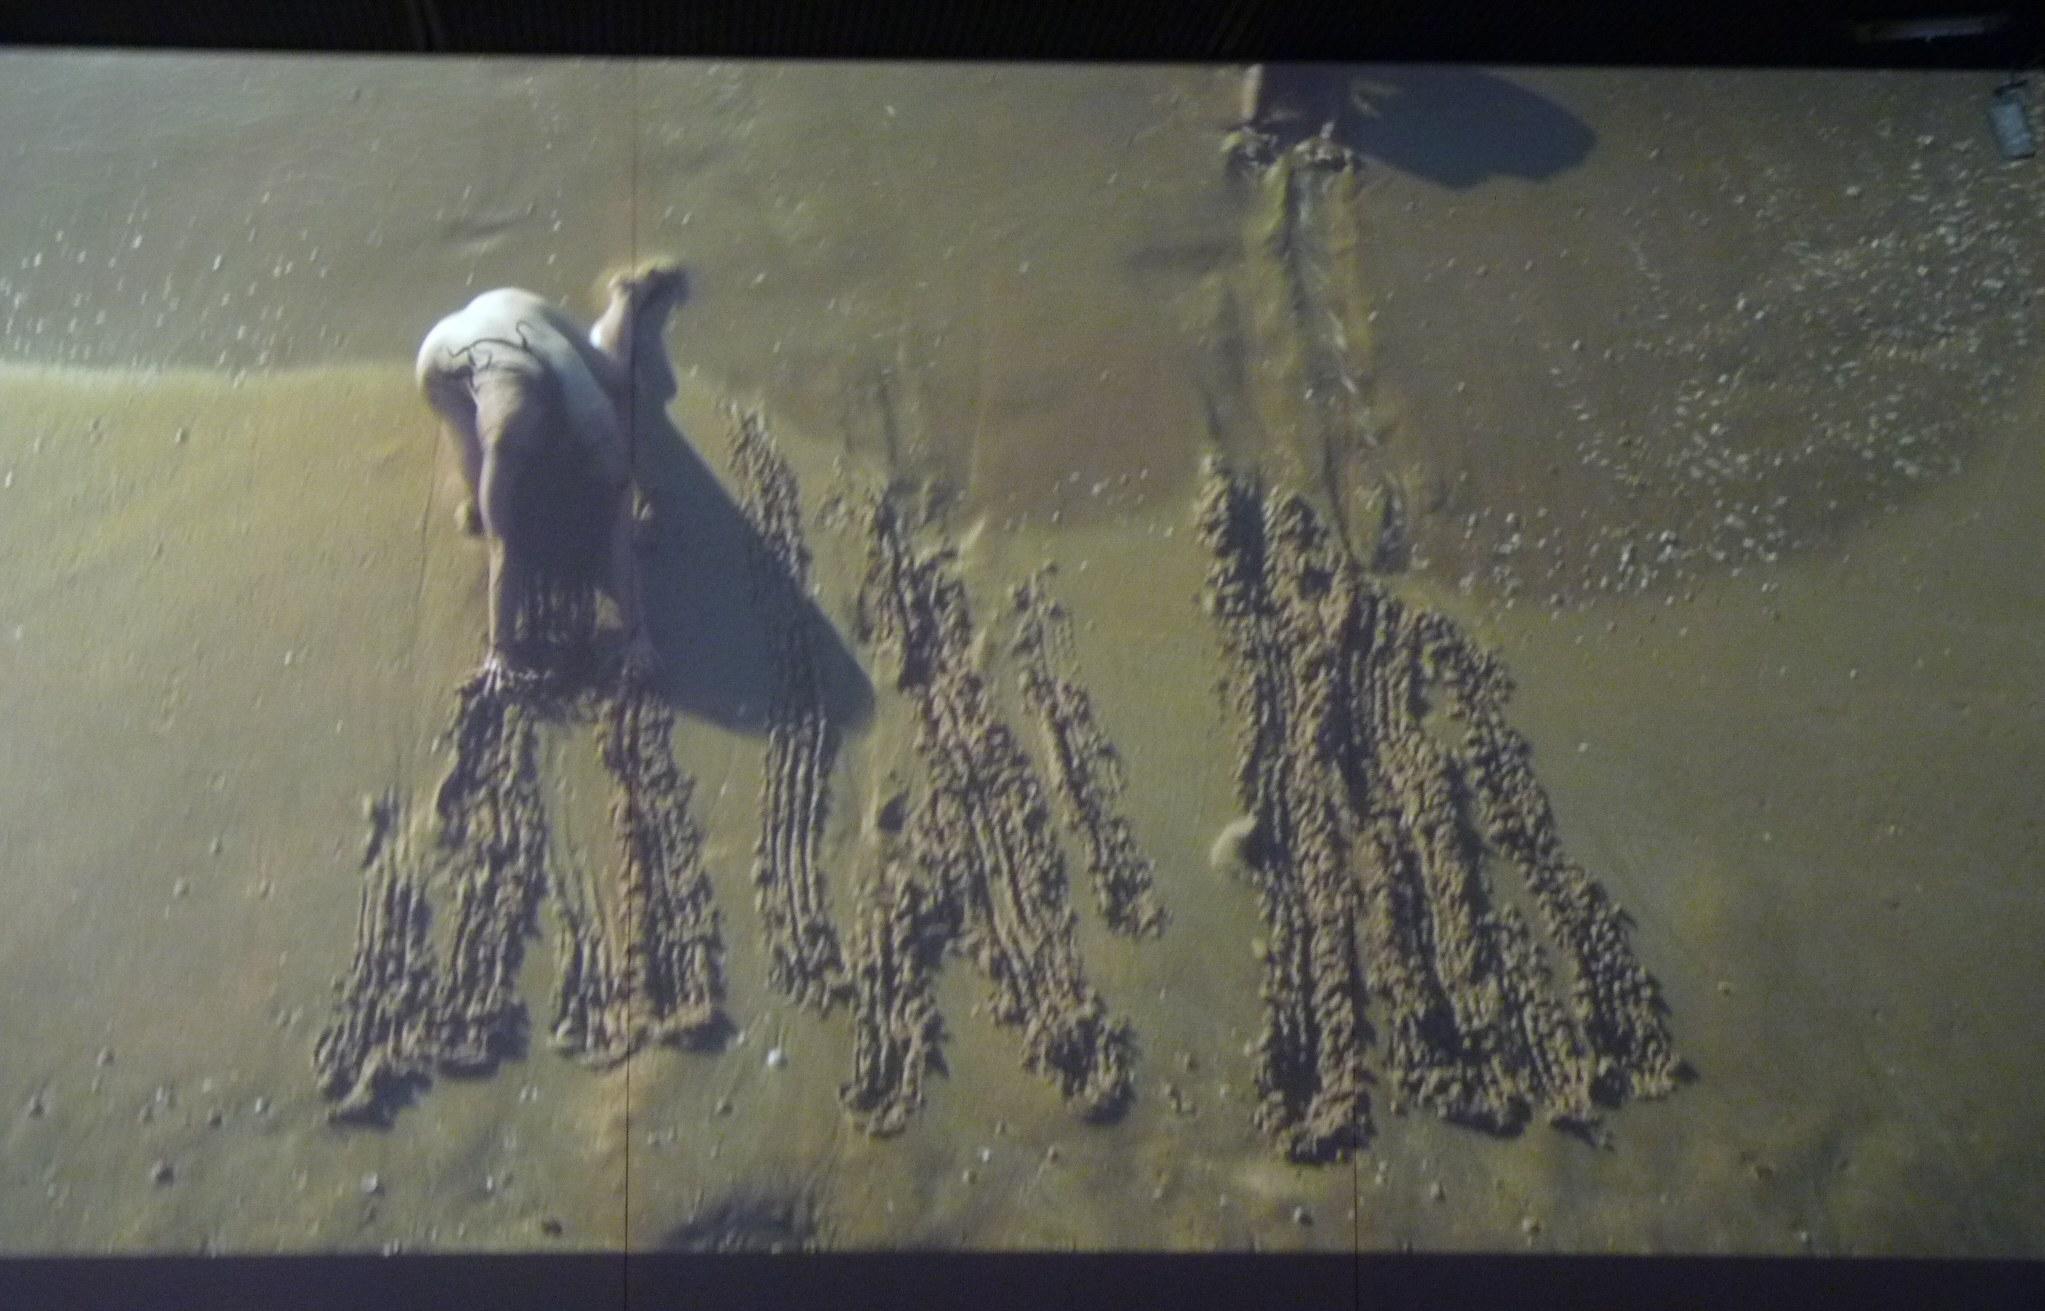 Mermaids@(Erasing the Border of Azkelon), vidéo